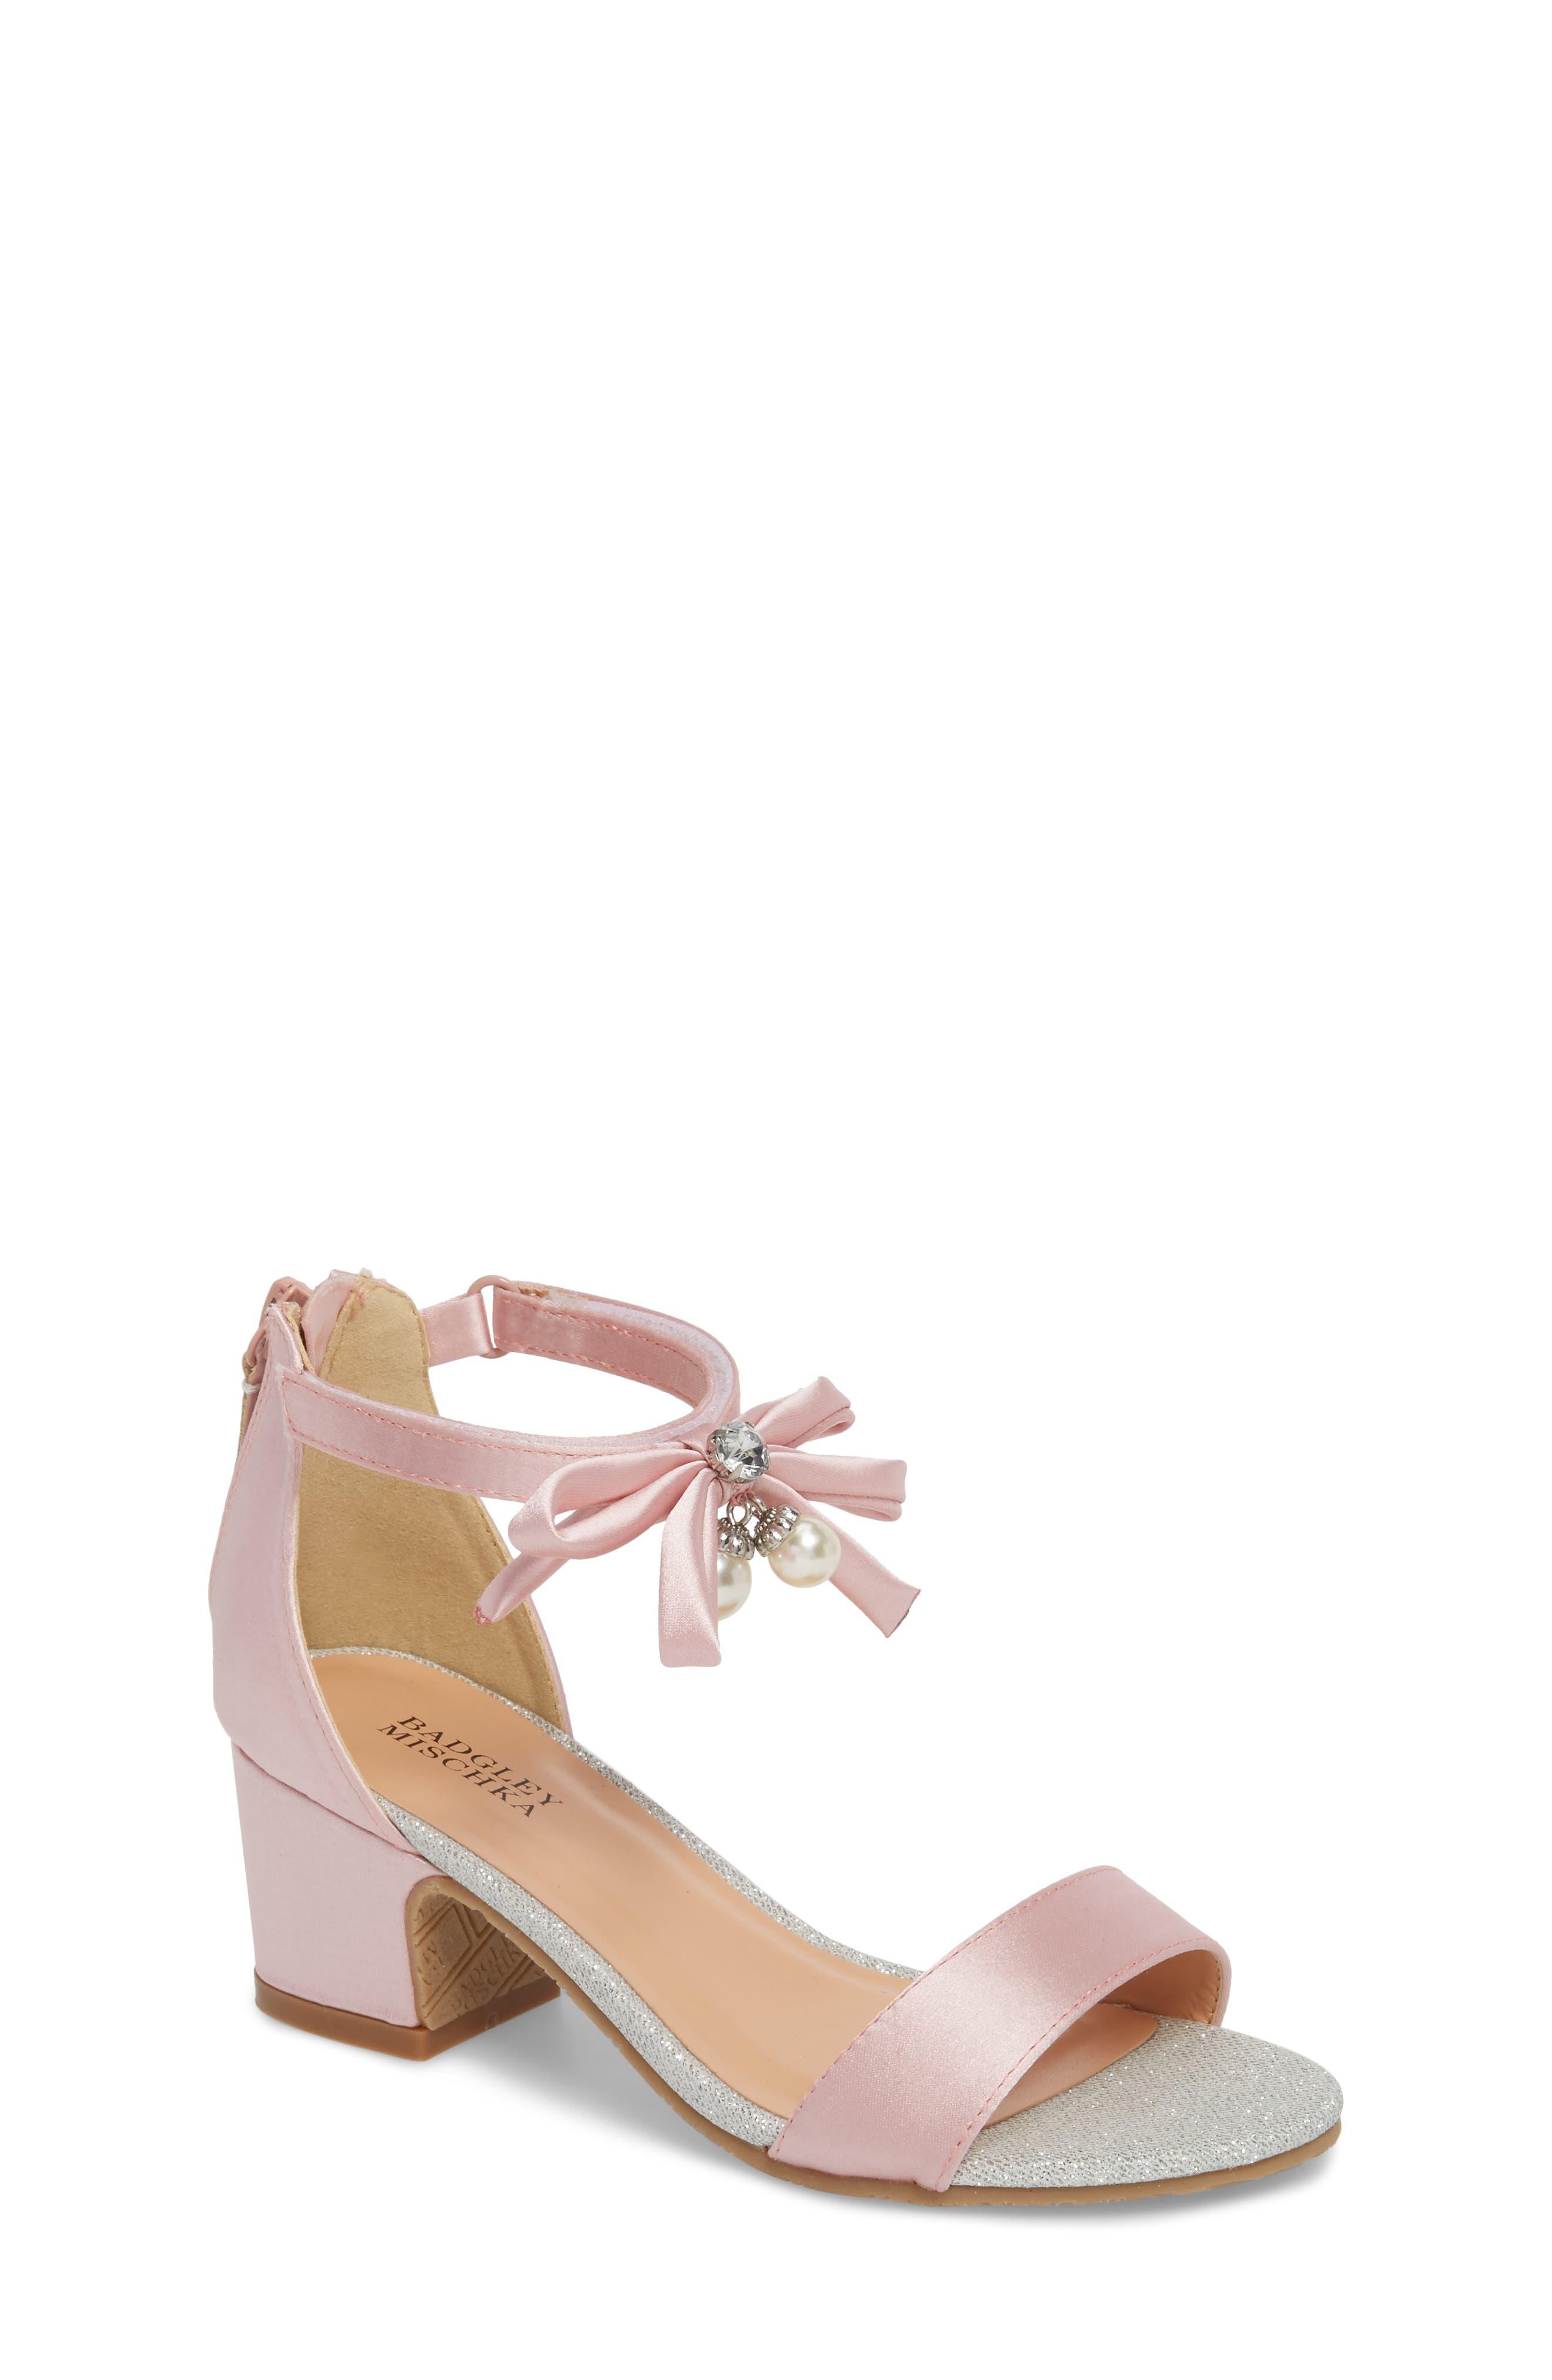 Pernia Embellished Sandal,                             Main thumbnail 1, color,                             PINK/ SILVER